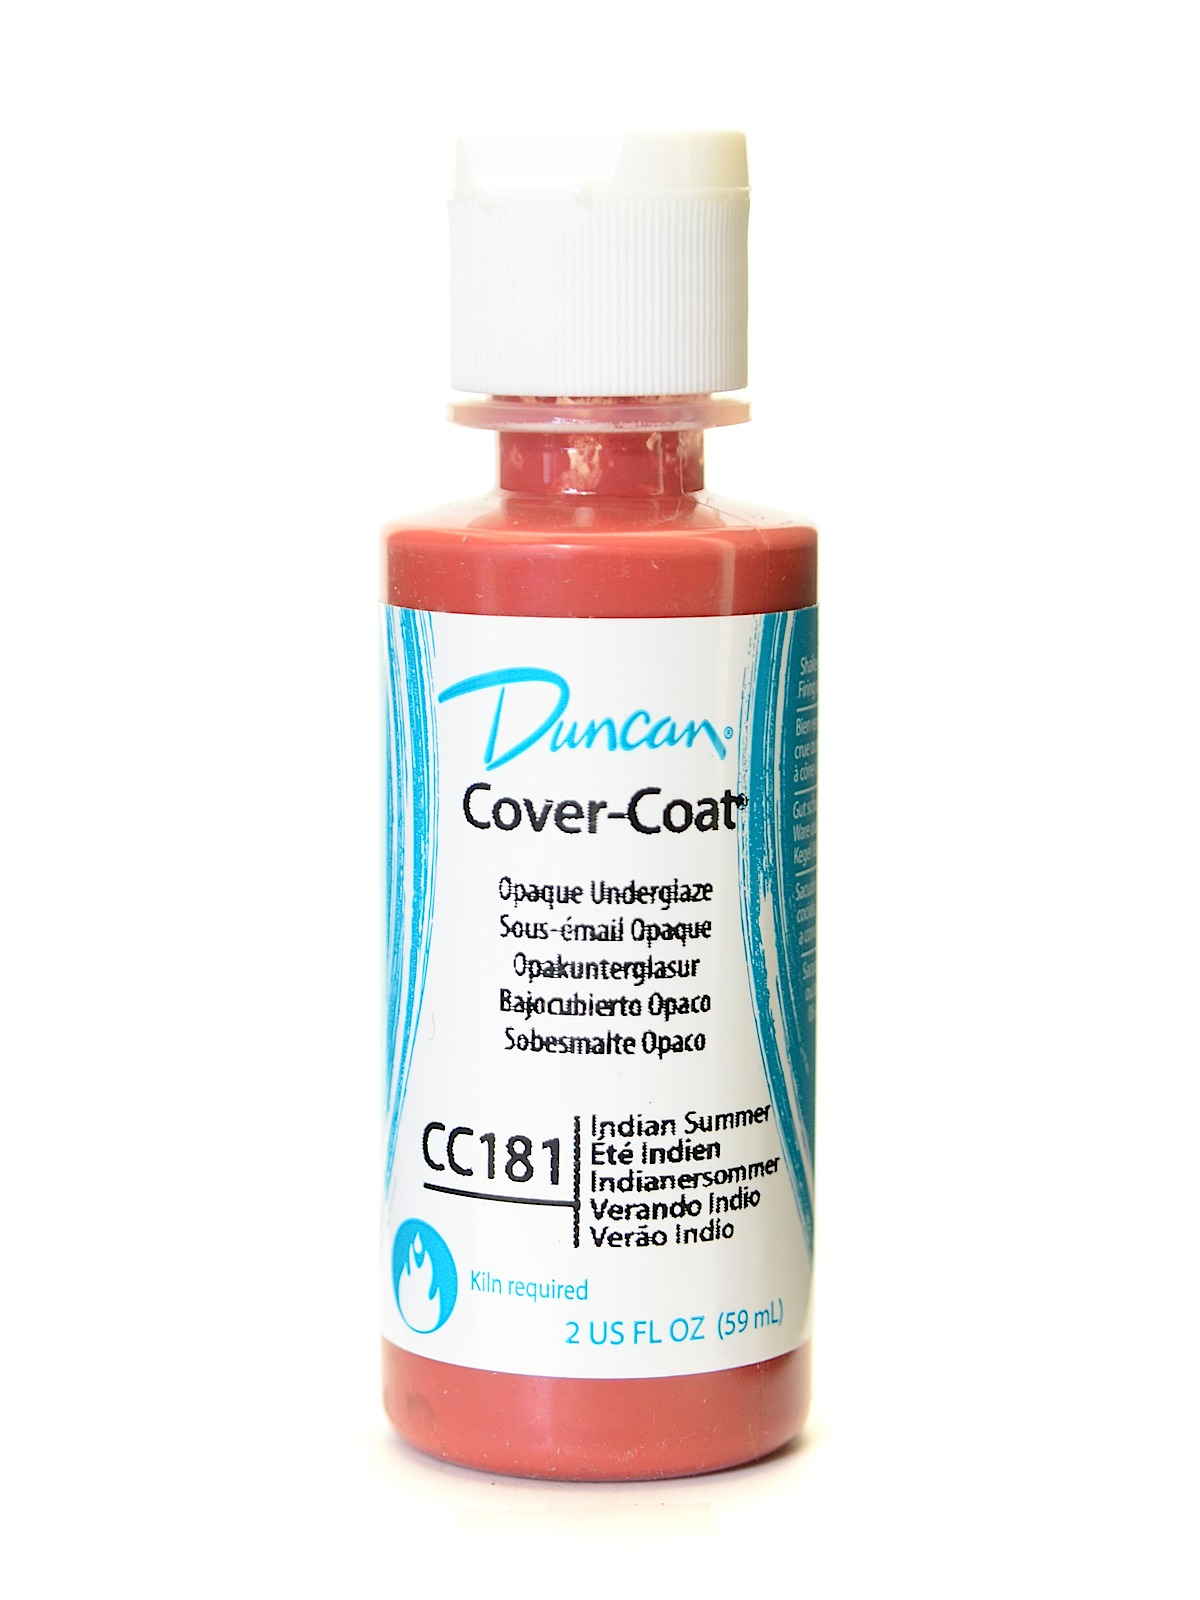 Duncan cover coat opaque underglazes misterart cover coat opaque underglazes geenschuldenfo Choice Image